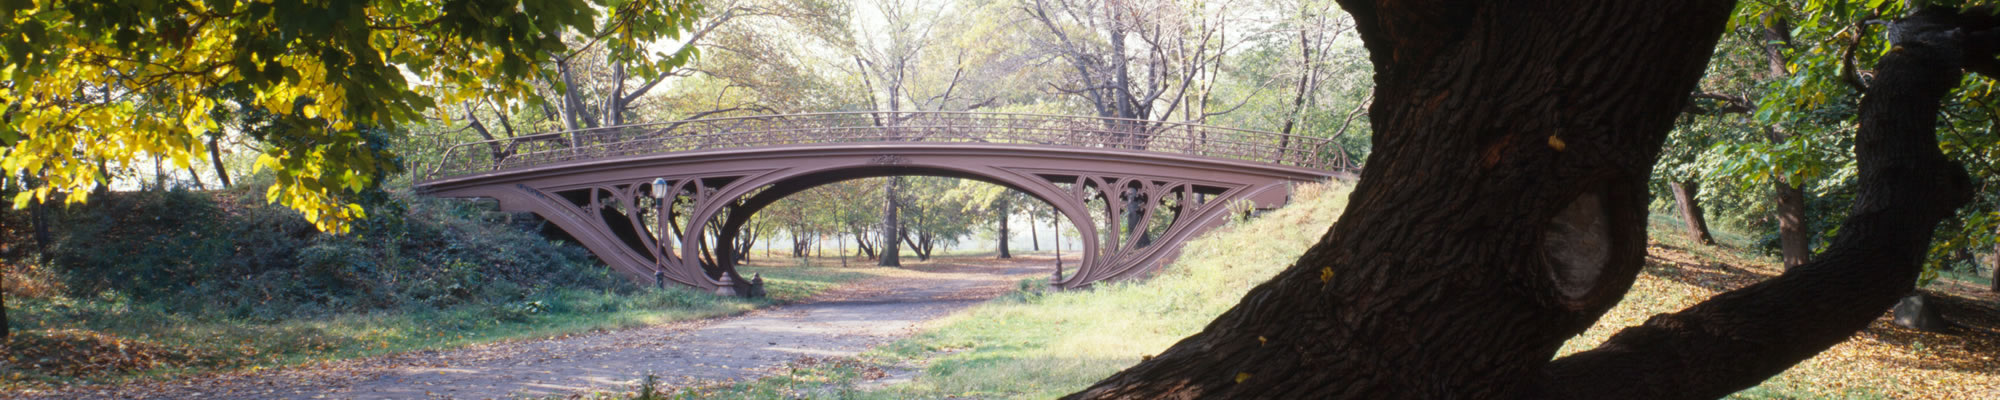 carousel central park